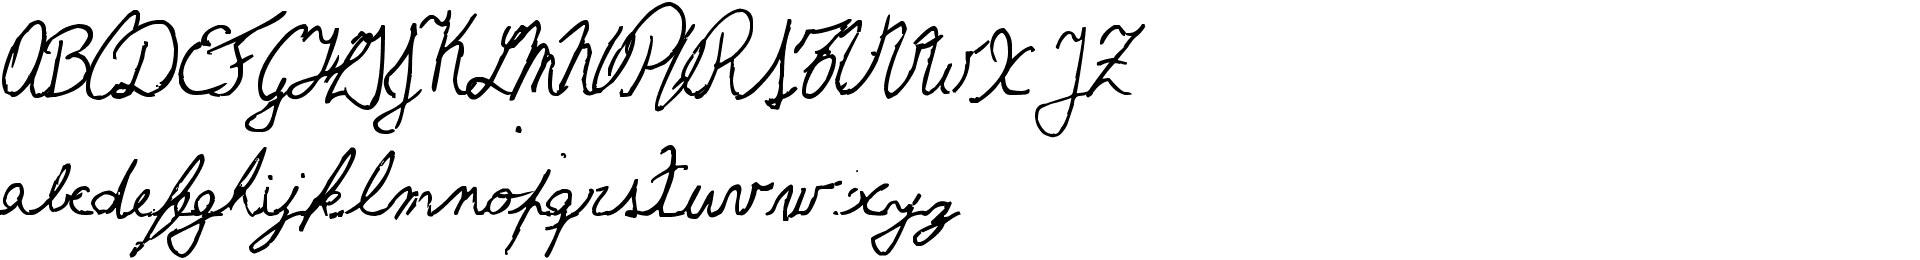 The Left-Handed Cursiva Cursiva